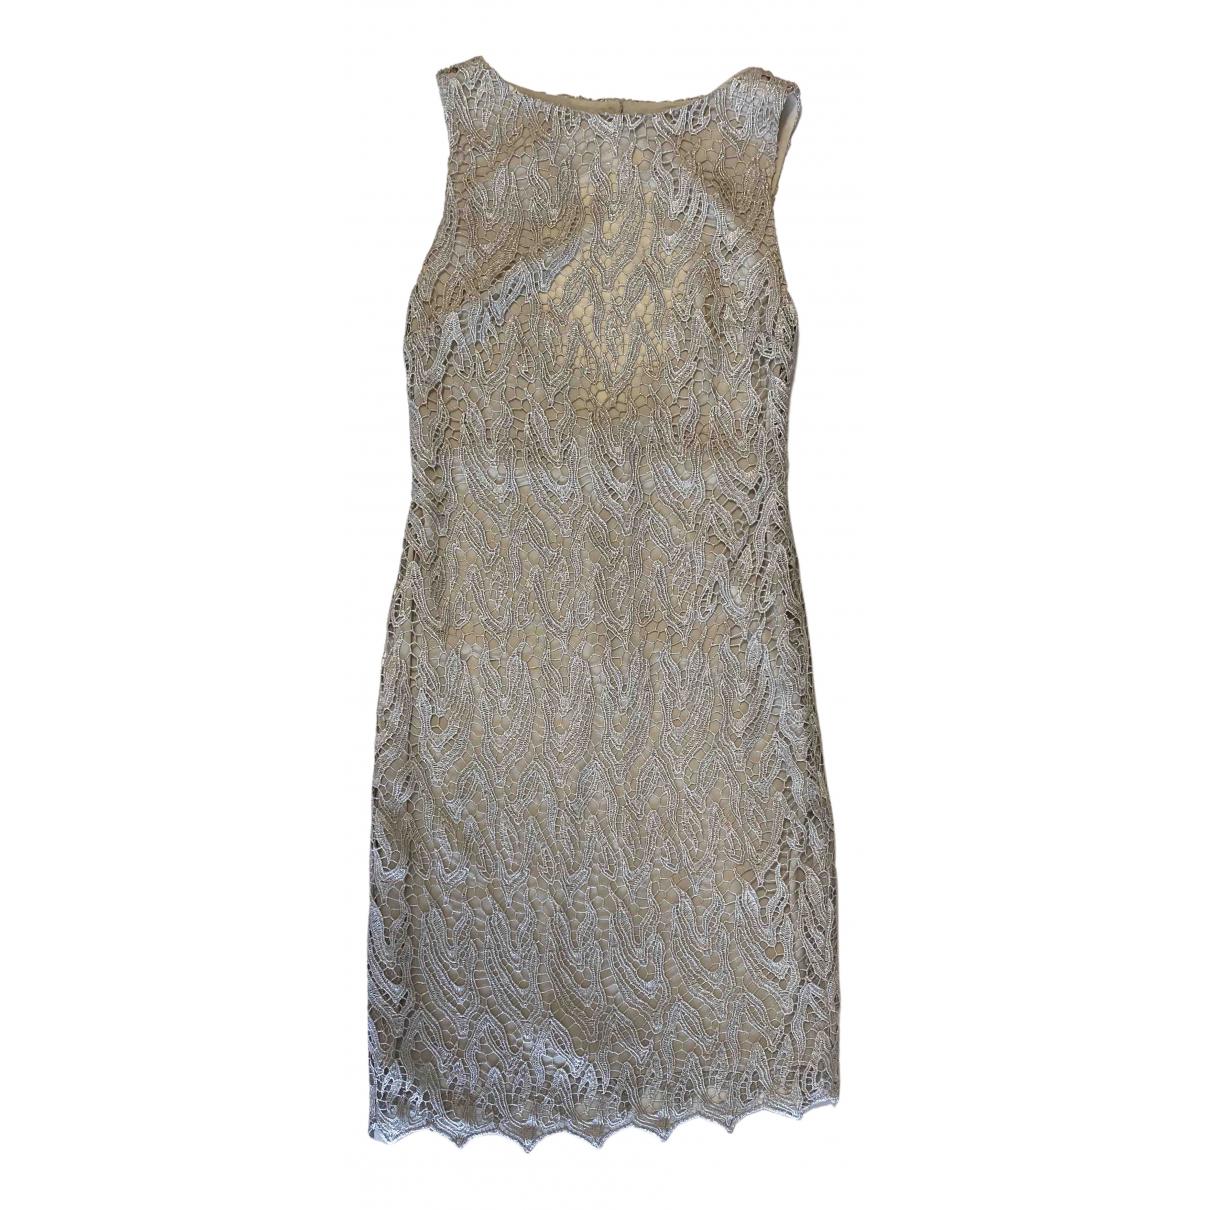 Alice & Olivia \N Metallic dress for Women 1 US